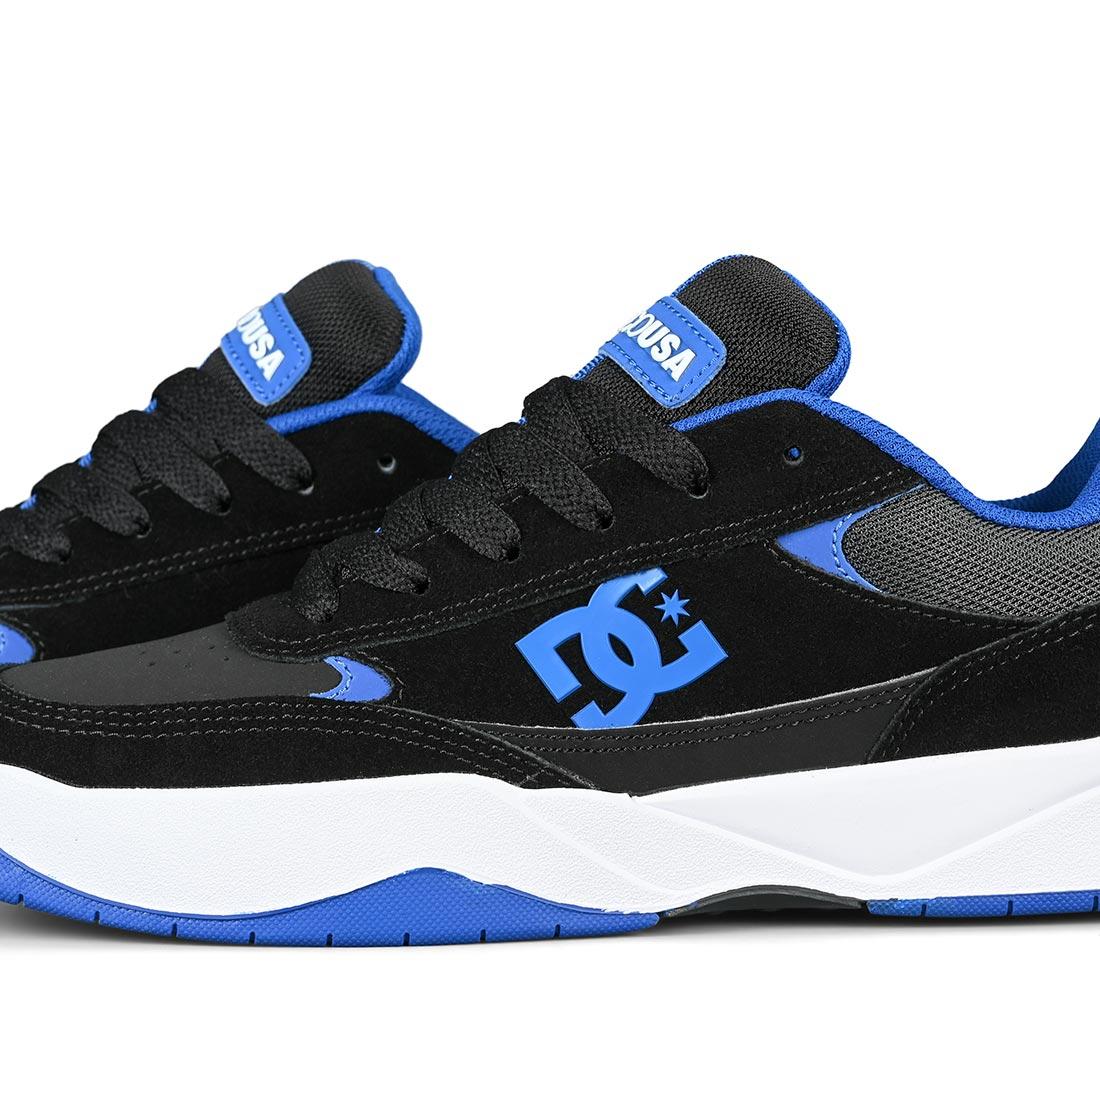 DC Shoes Penza - Nautical Blue